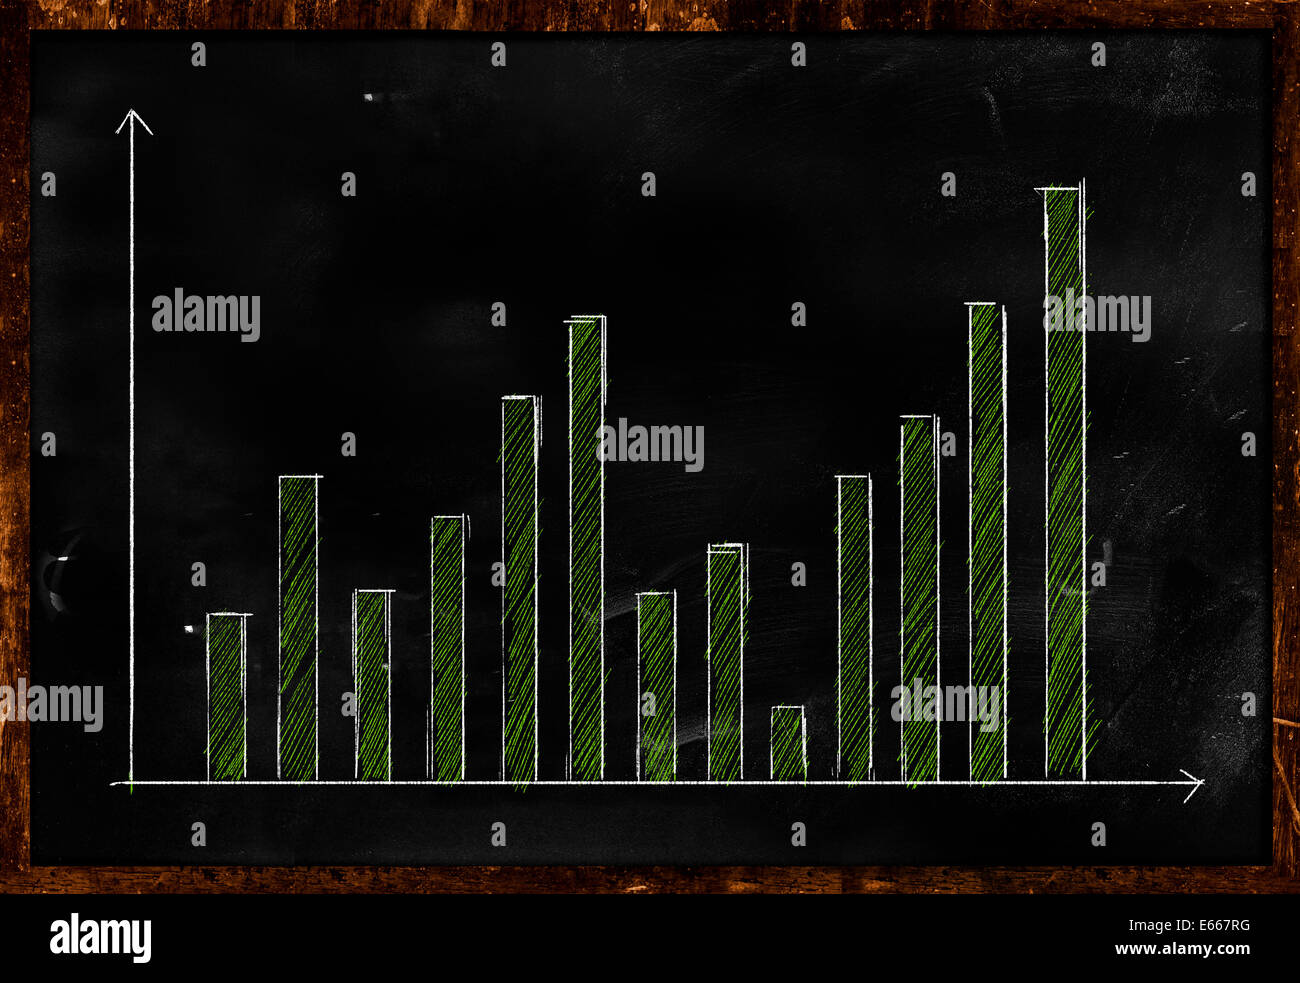 Data Statistic Green on Blackboard Sketch Drawing - Stock Image